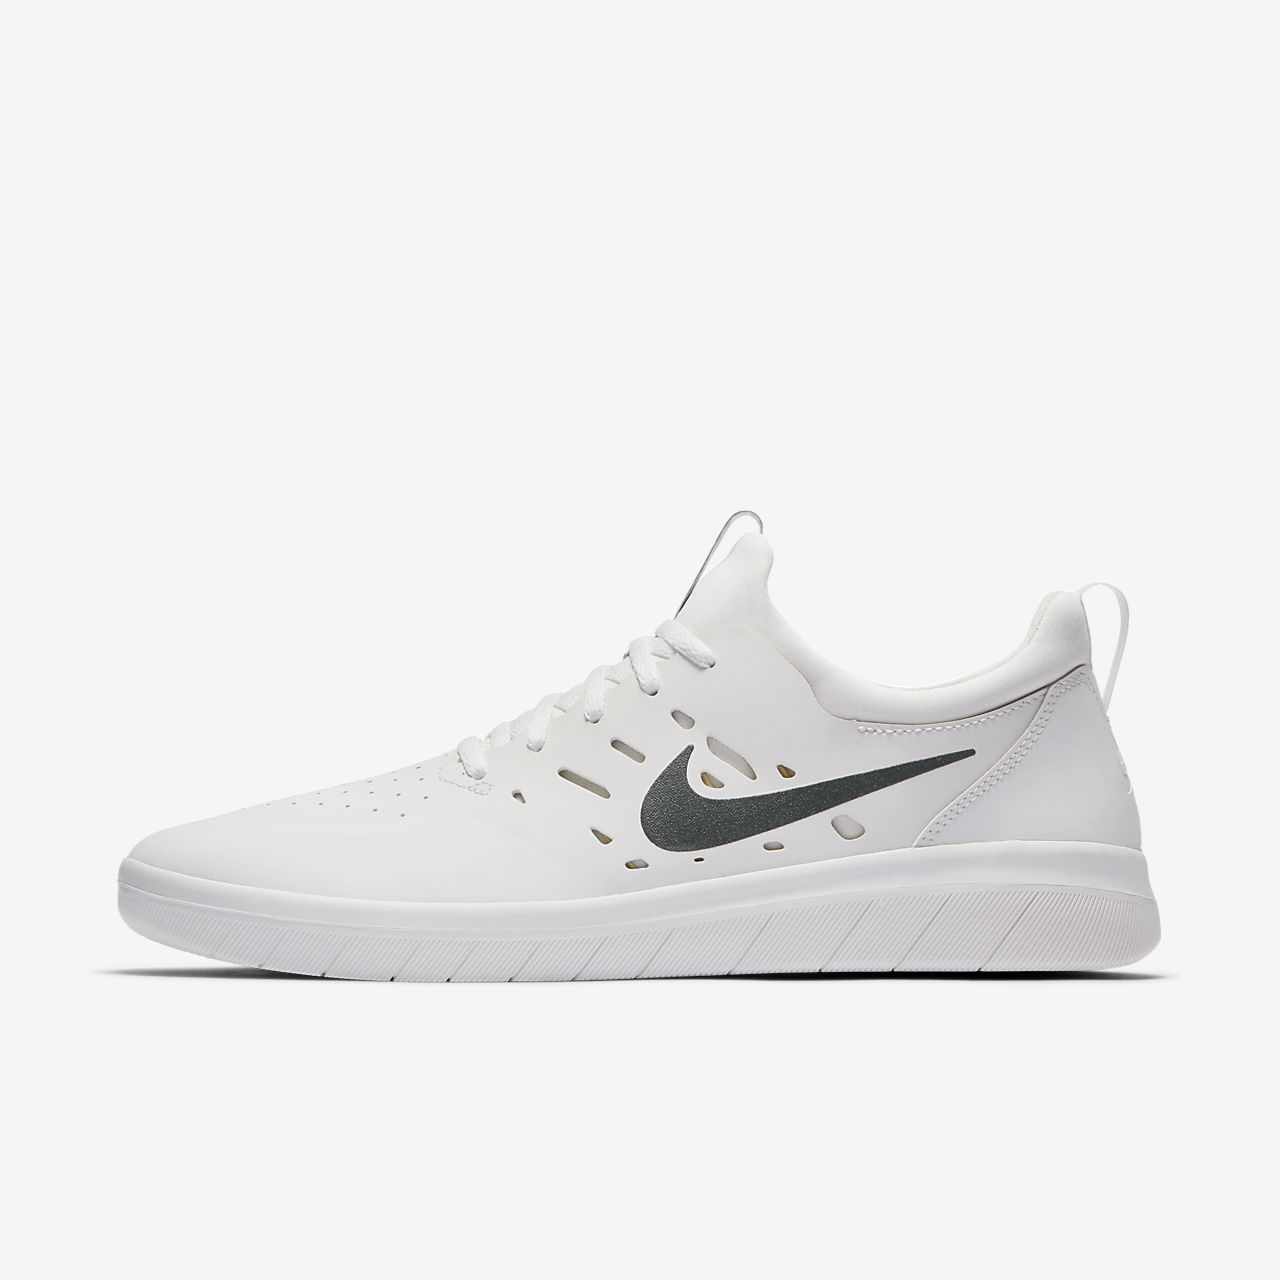 Nike Dunk scarpe